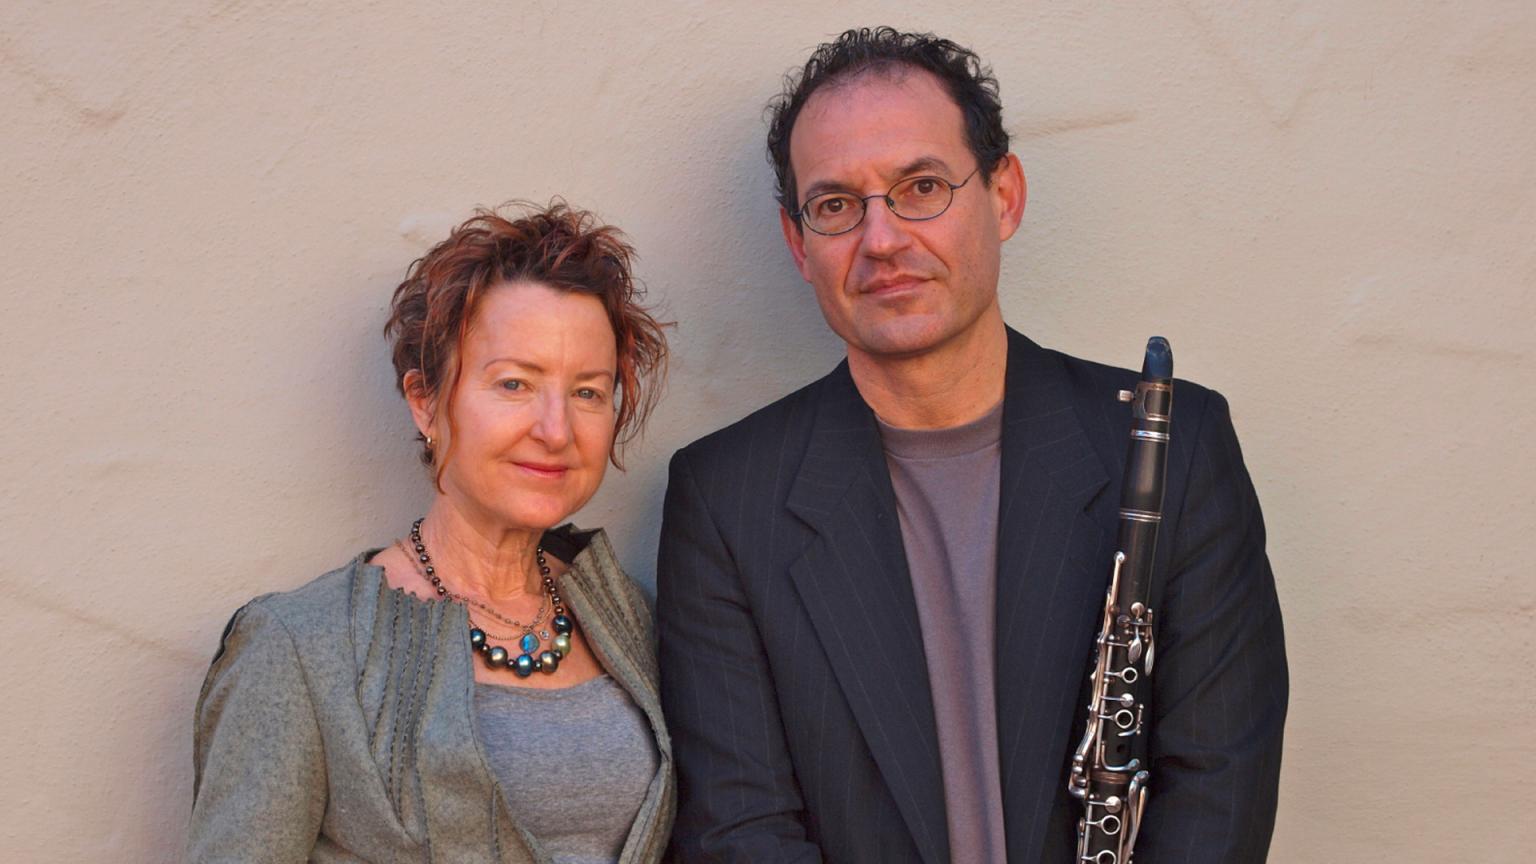 Myra Melford & Ben Goldberg